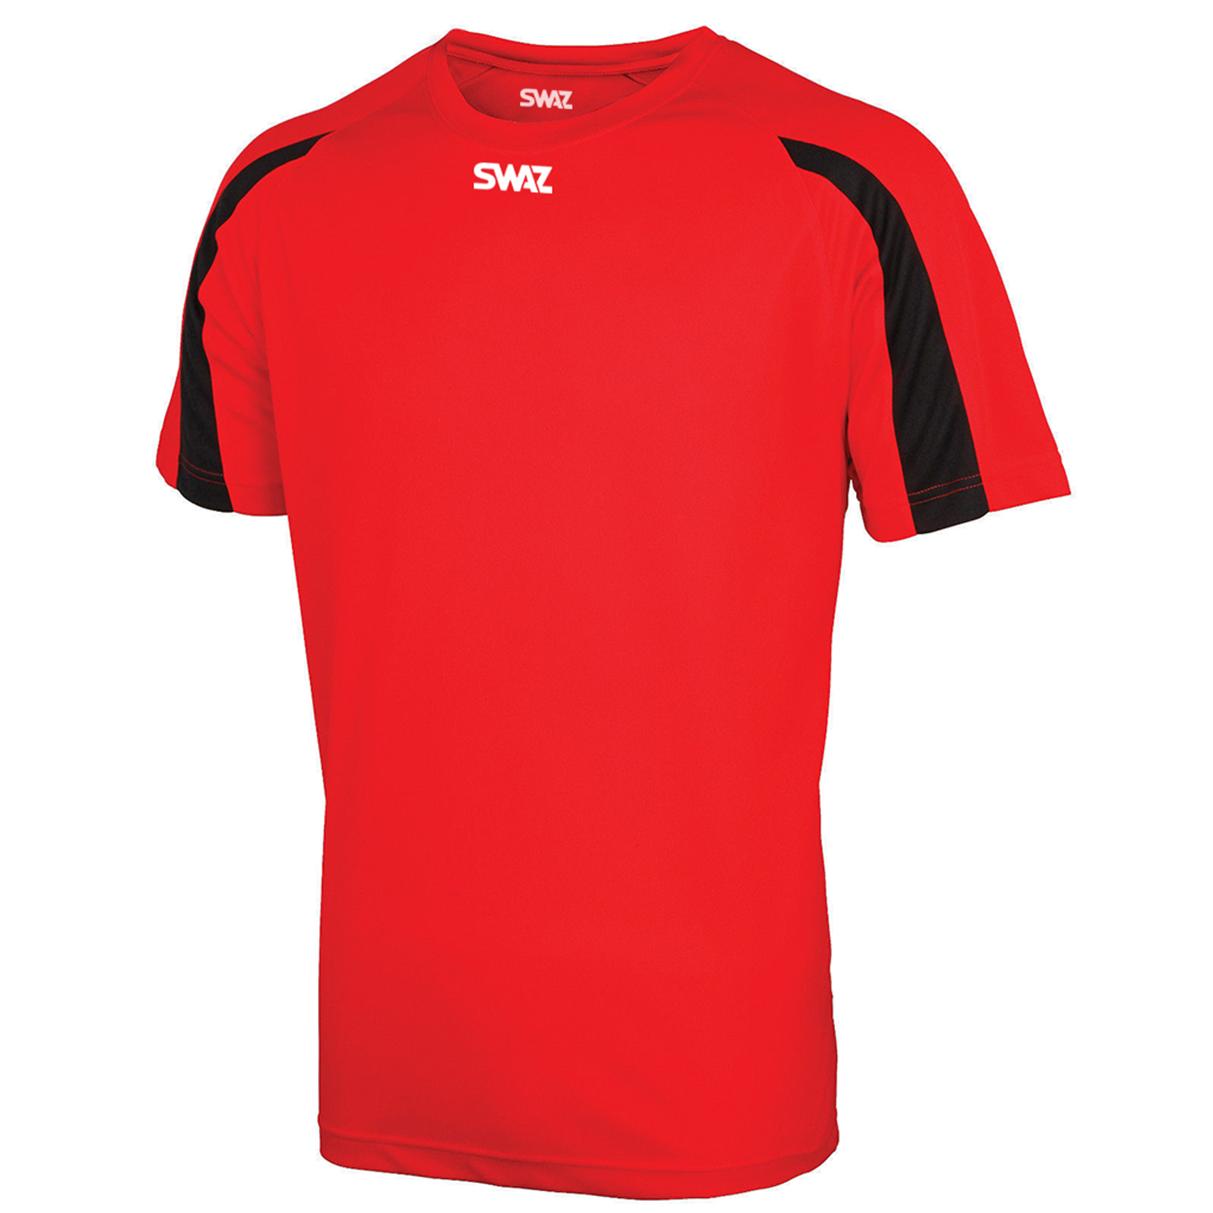 SWAZ Premier Training T-Shirt – Red/Black